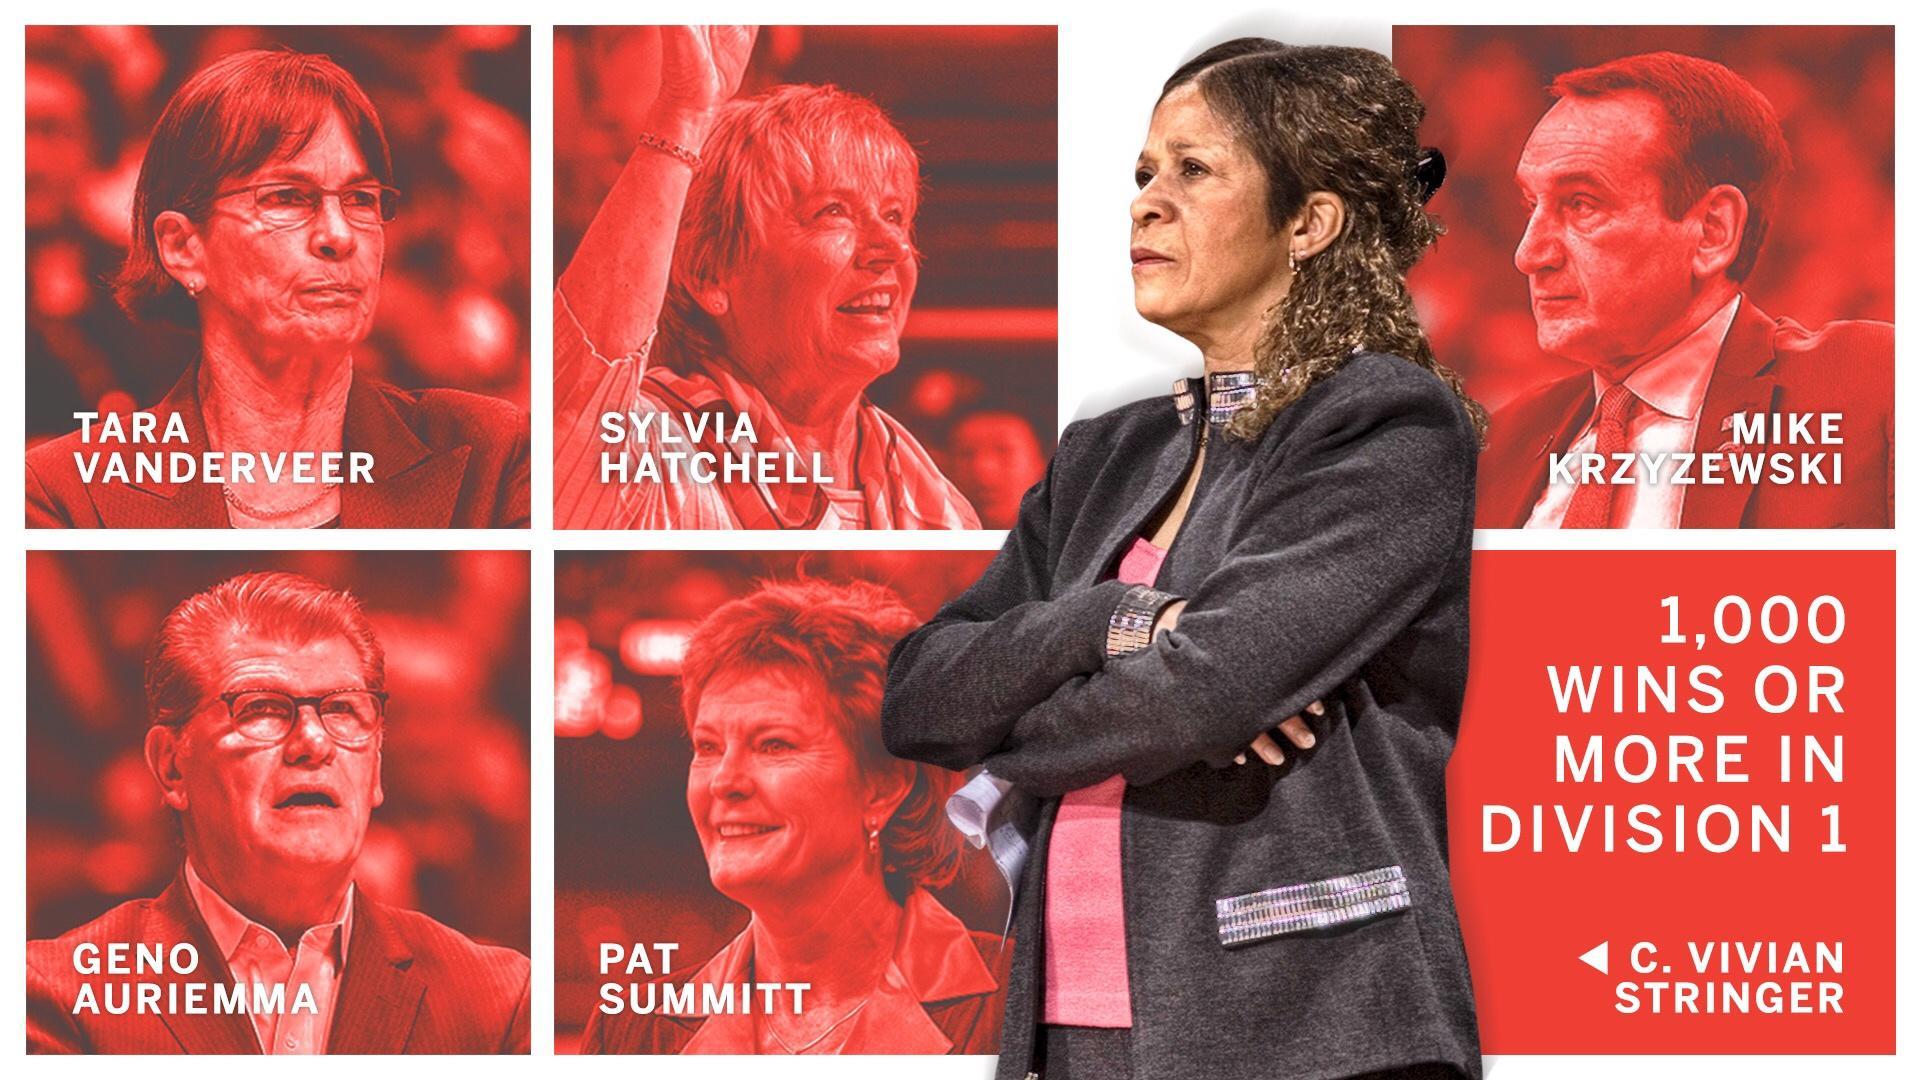 Rutgers coach C. Vivian Stringer is now the 6th Division 1 coach to reach 1,000 wins. https://t.co/chaYzu3BqJ